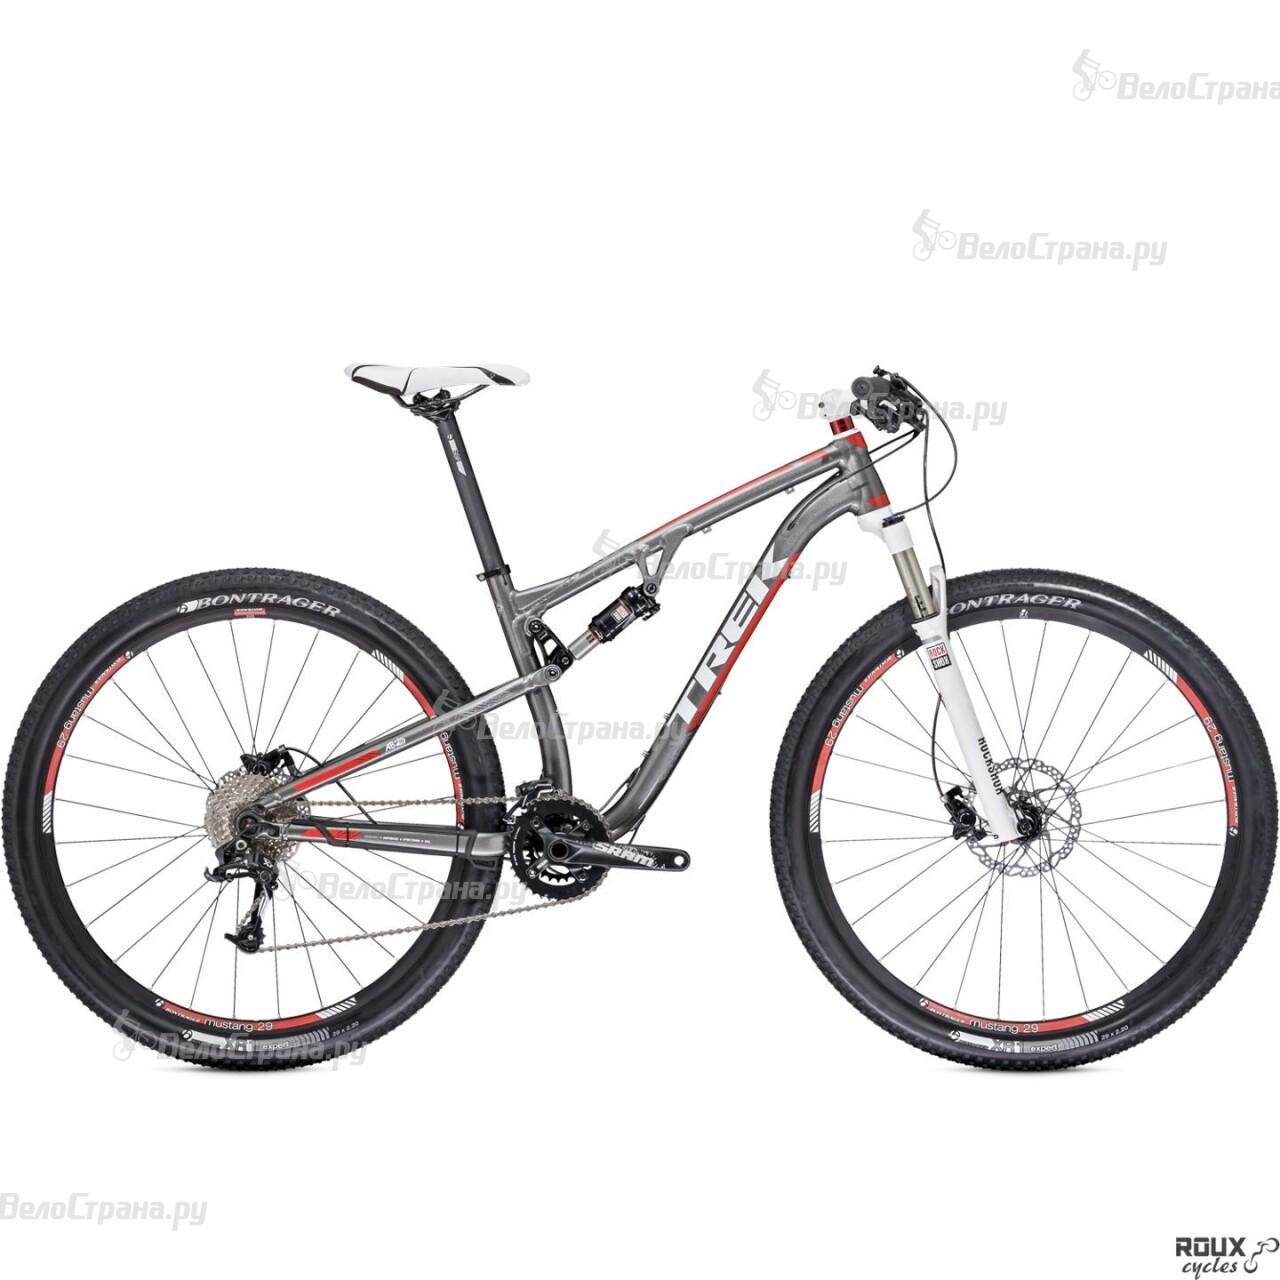 Велосипед Trek Superfly FS 7 (2014) велосипед trek superfly fs 7 2014